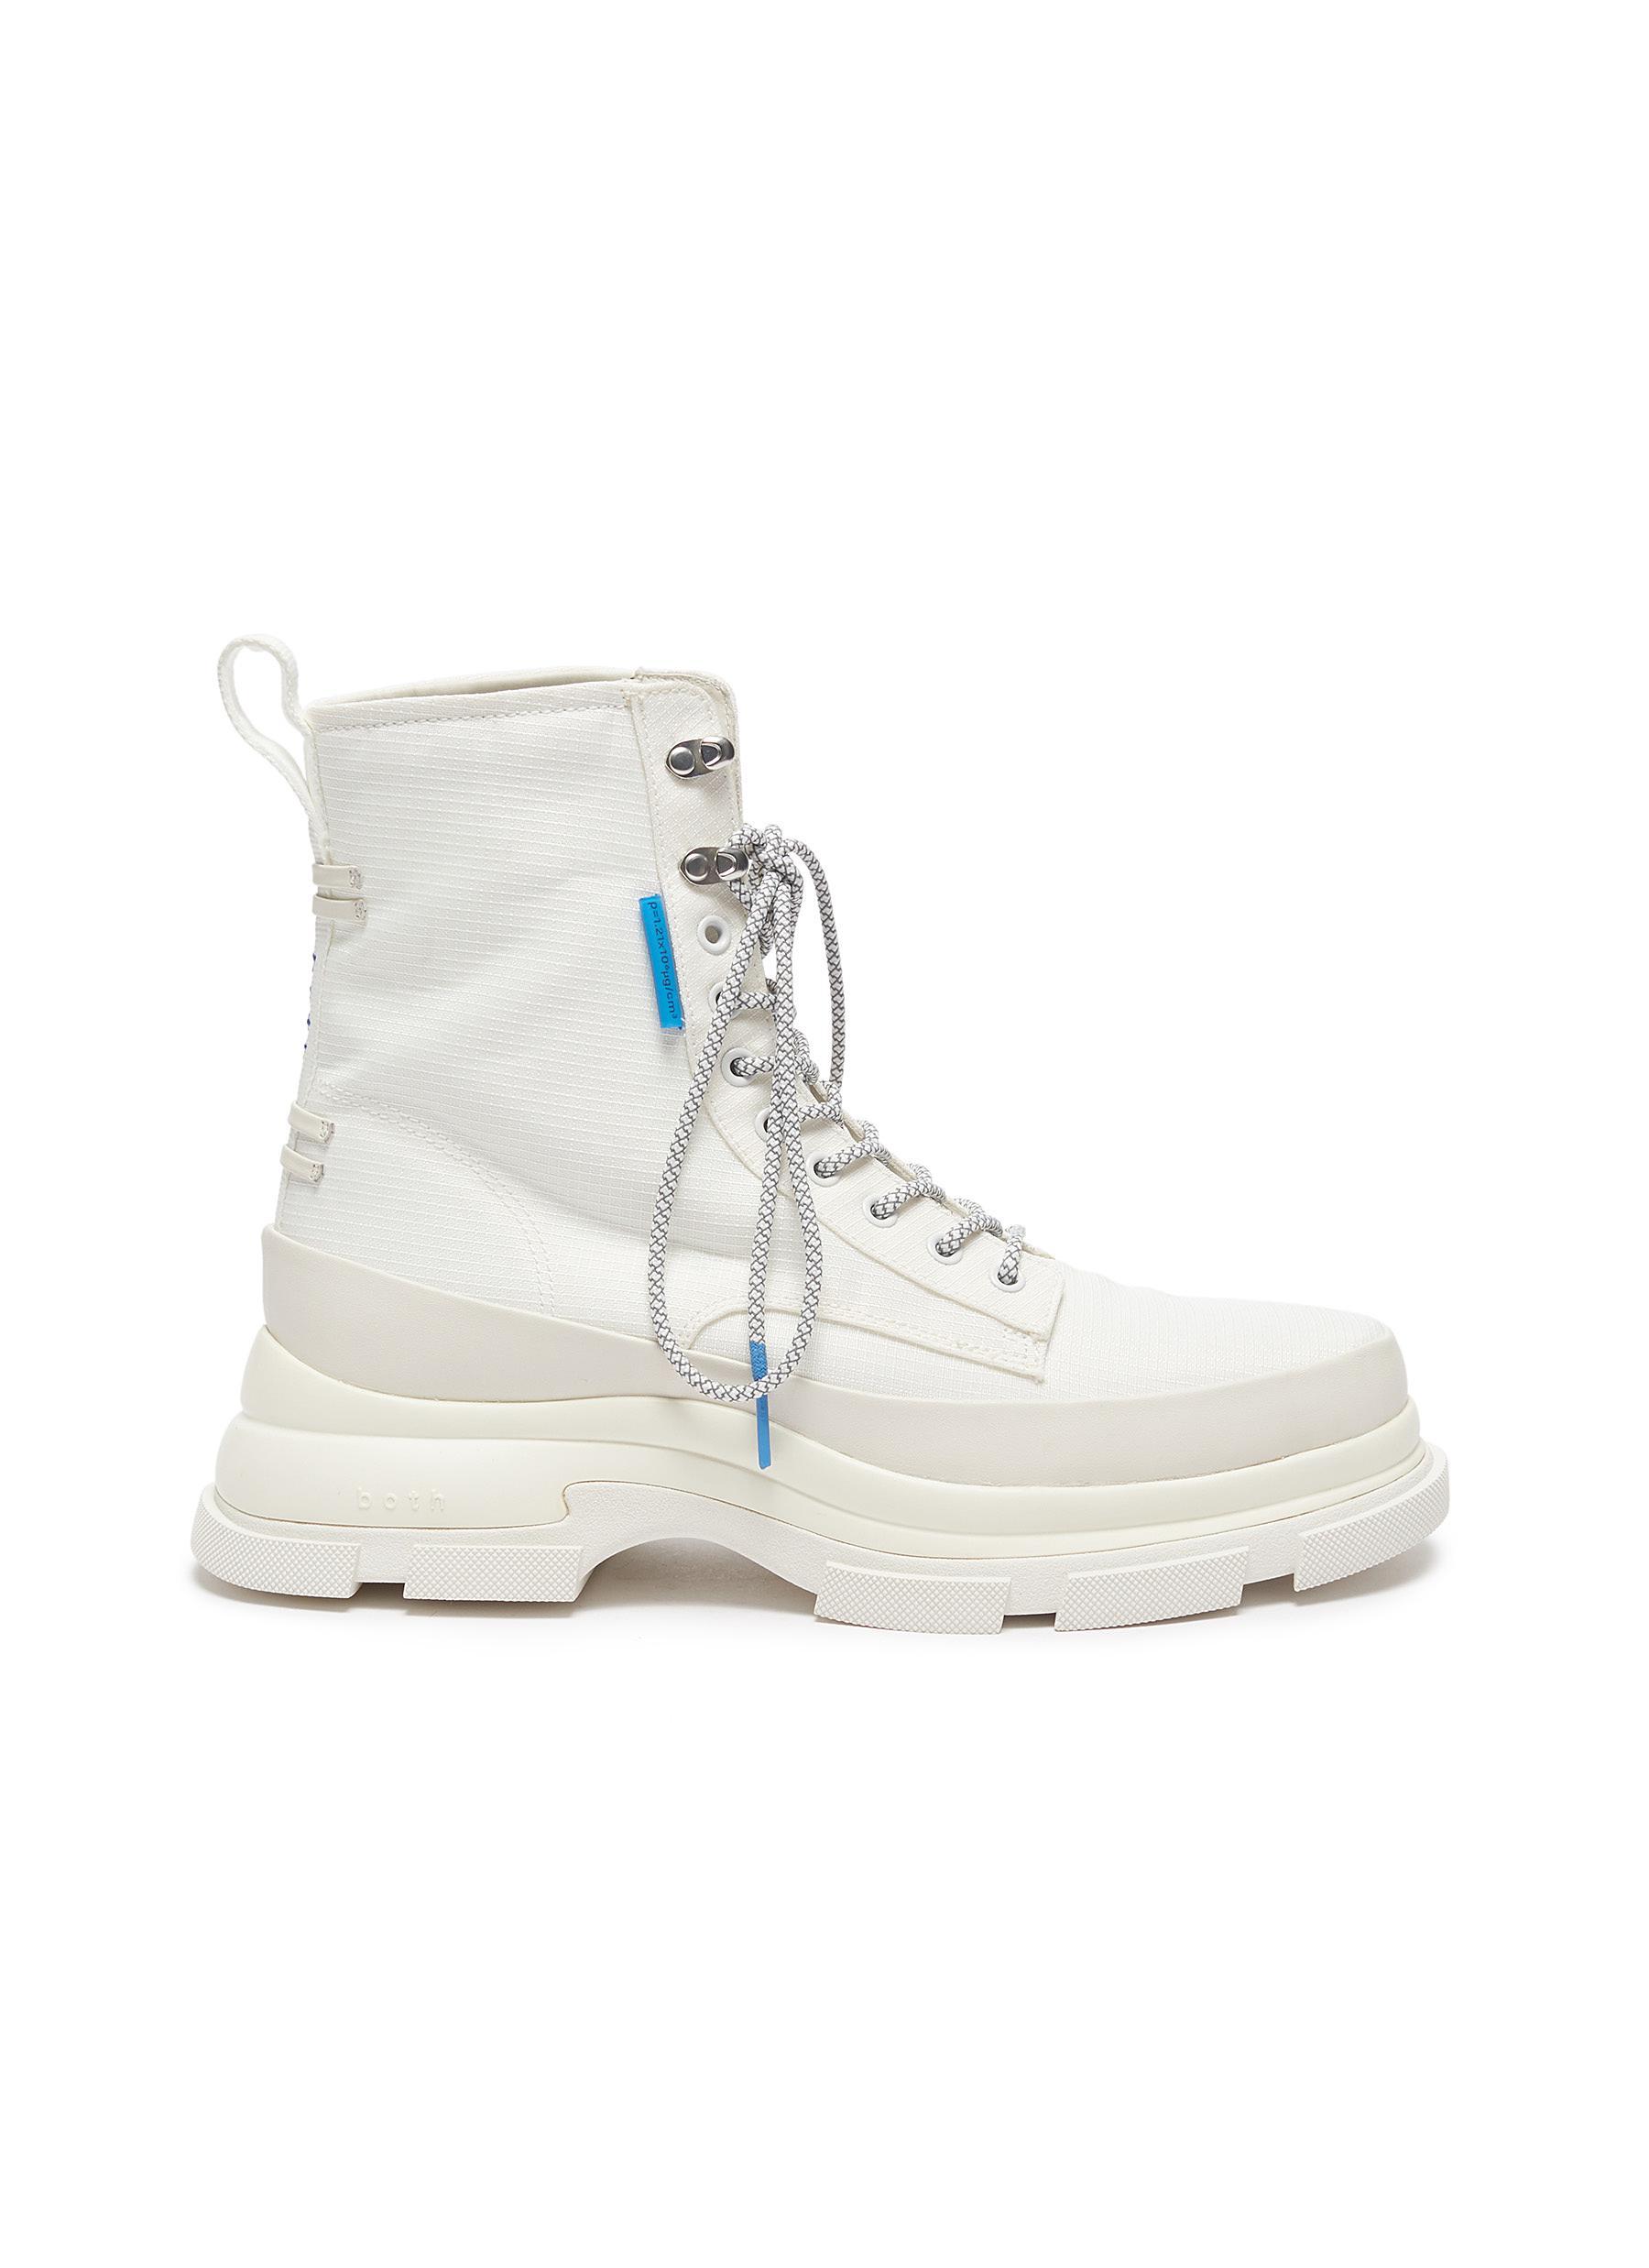 Gao' Eva High Top Sneakers